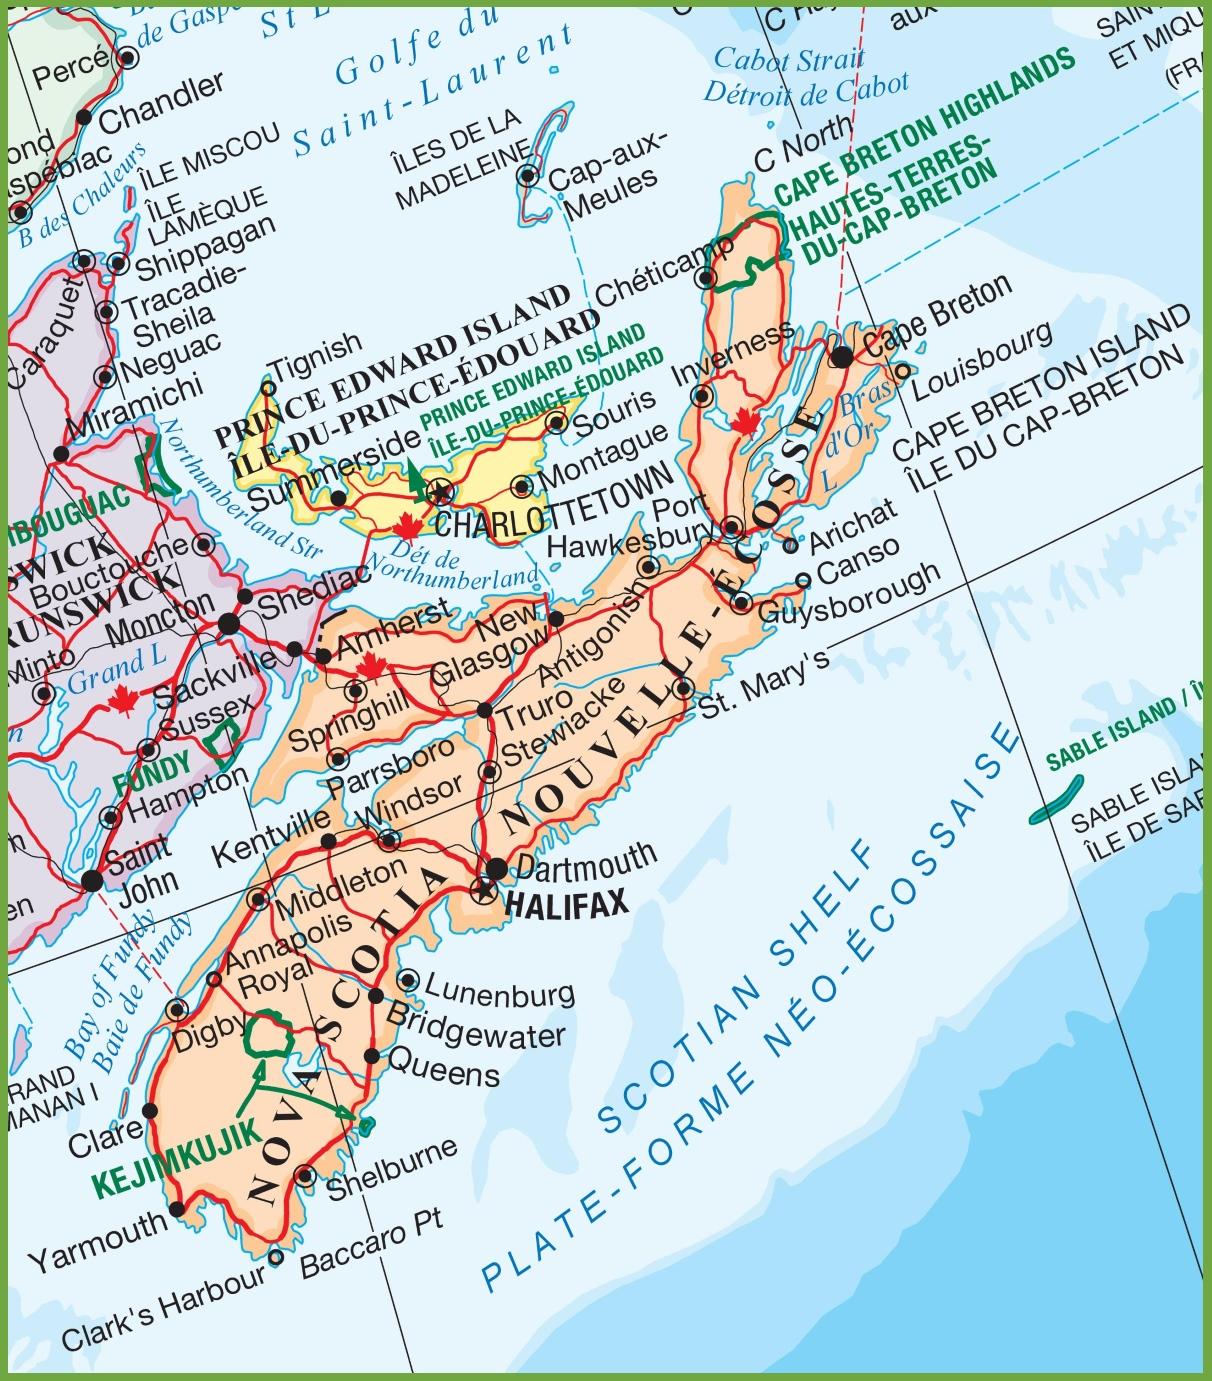 Map Of Nova Scotia Canada Nova Scotia national parks map Map Of Nova Scotia Canada